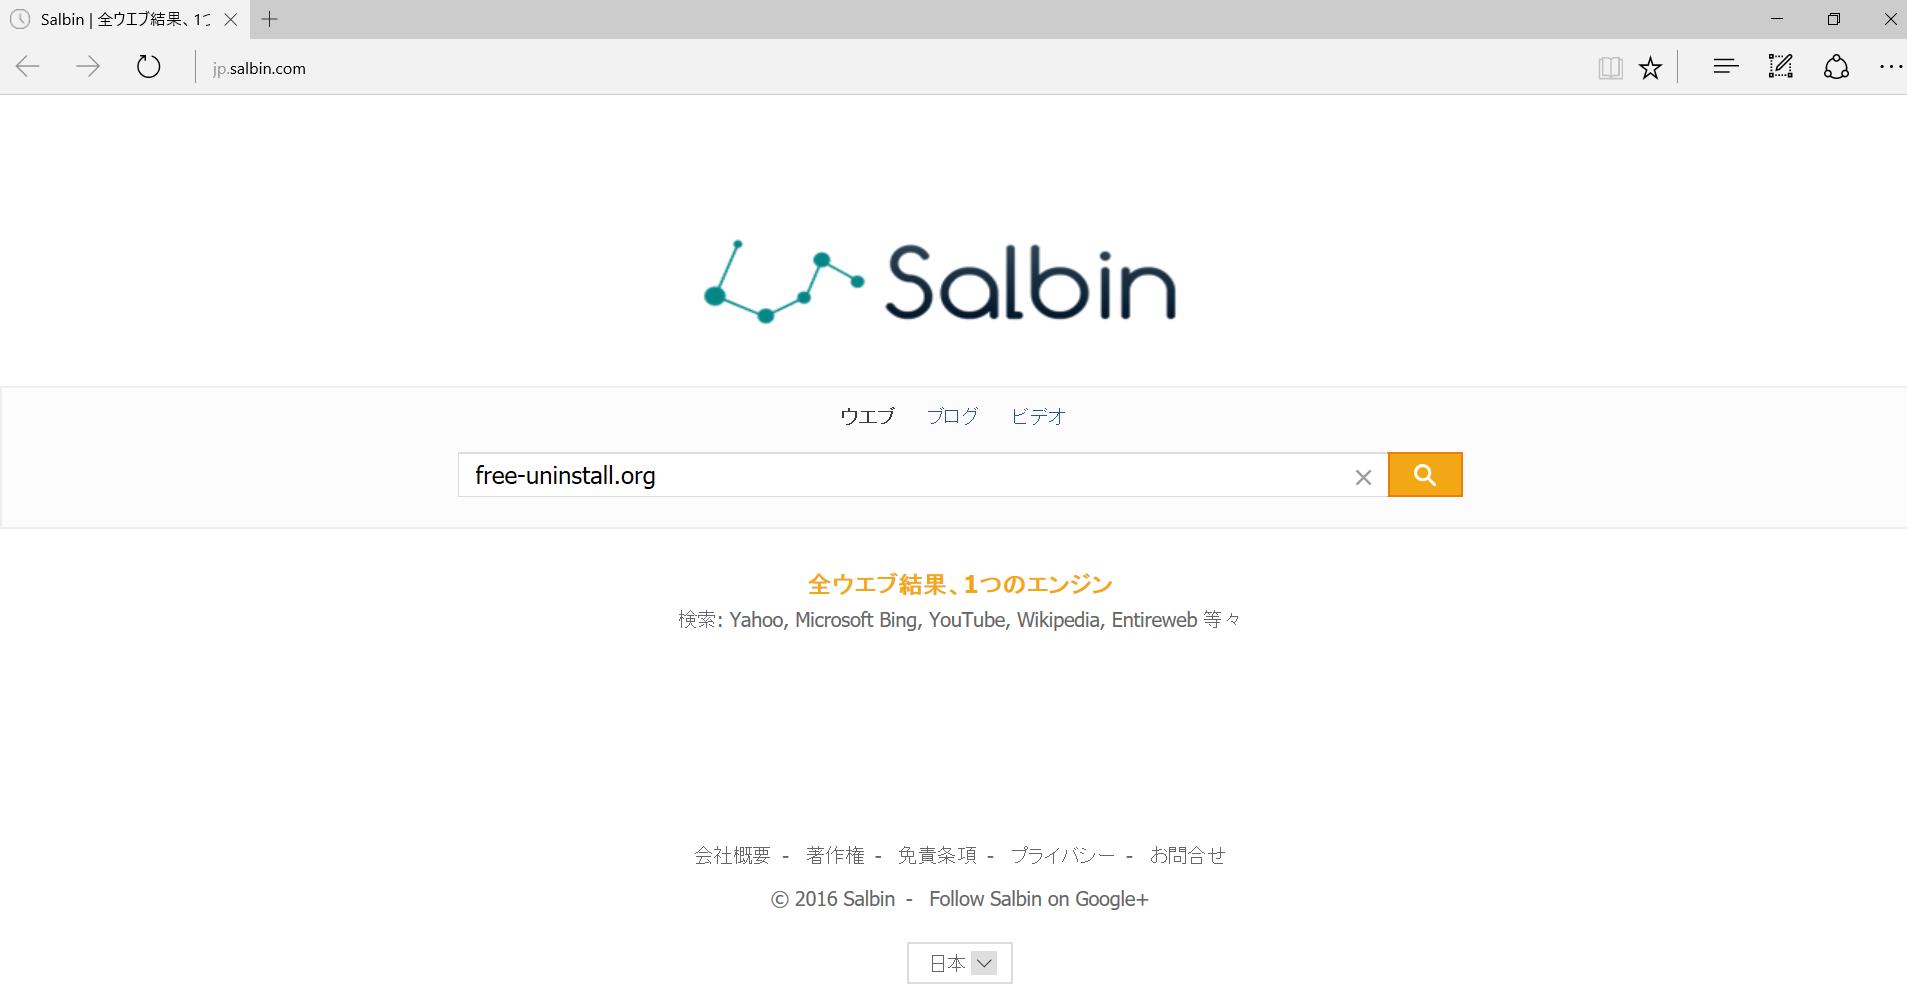 Jp.salbin.com Hijacker